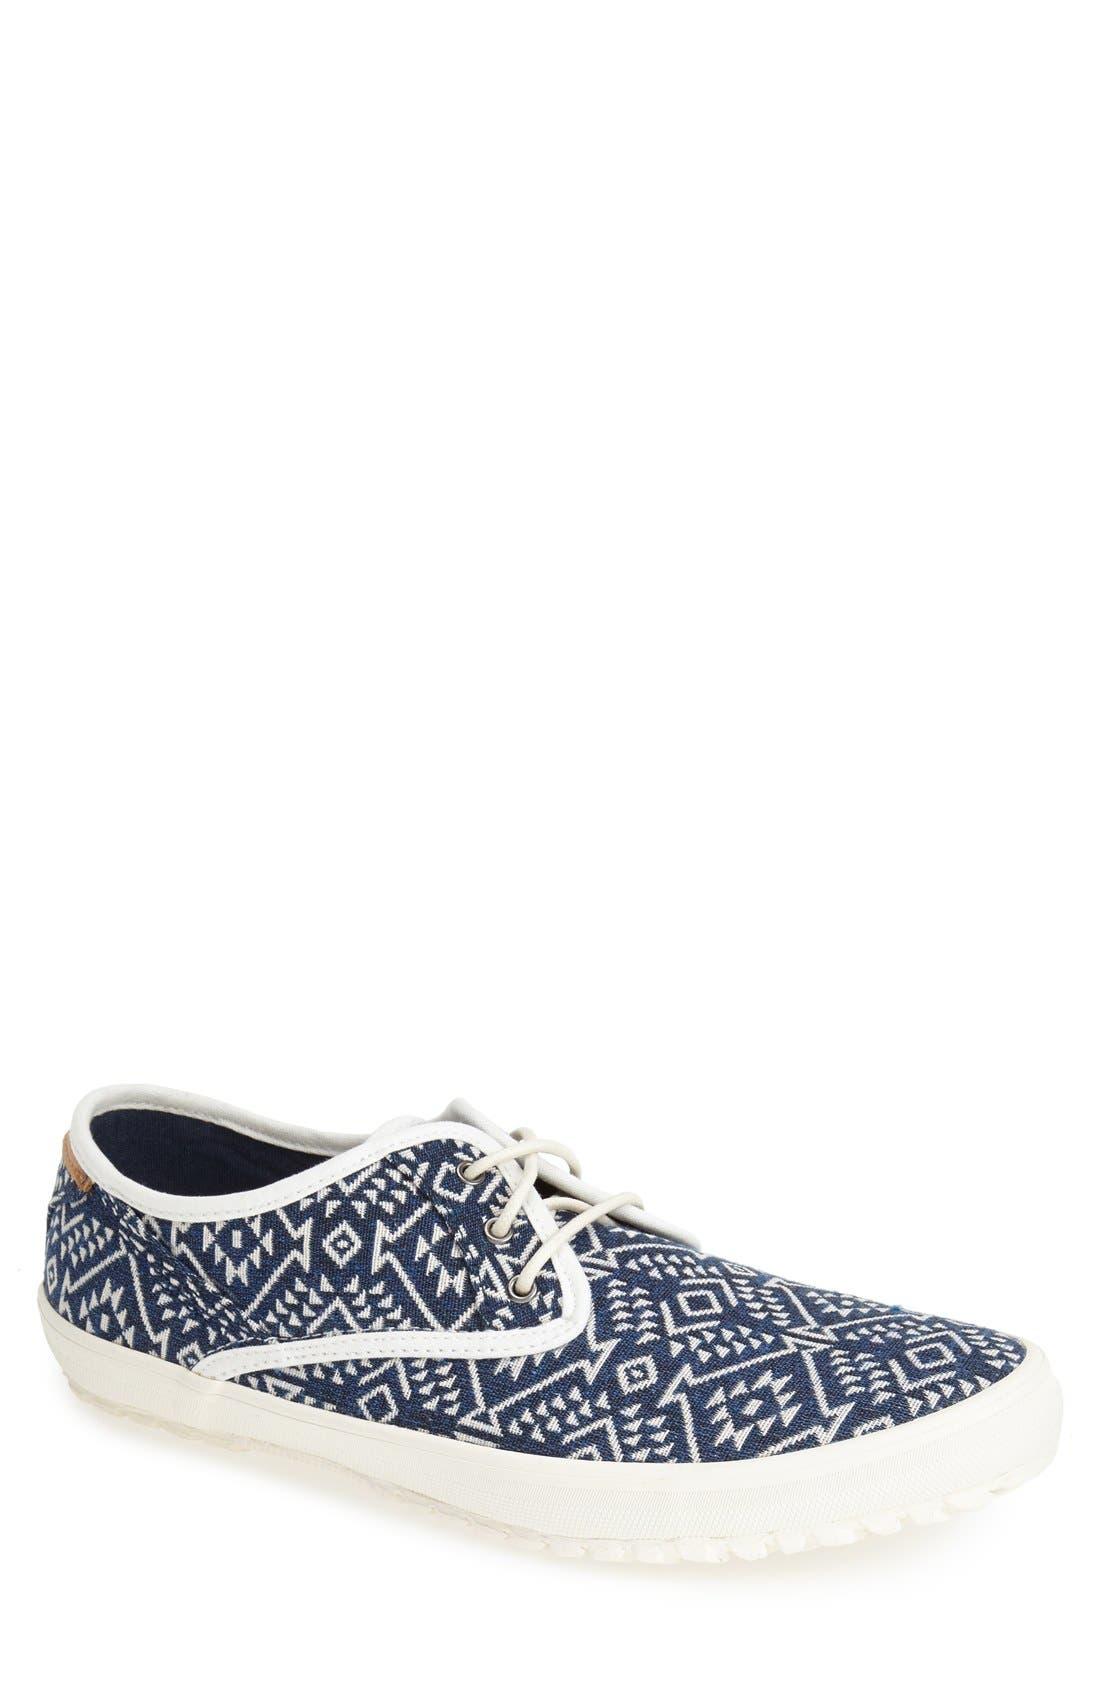 Main Image - J SHOES 'Civil' Sneaker